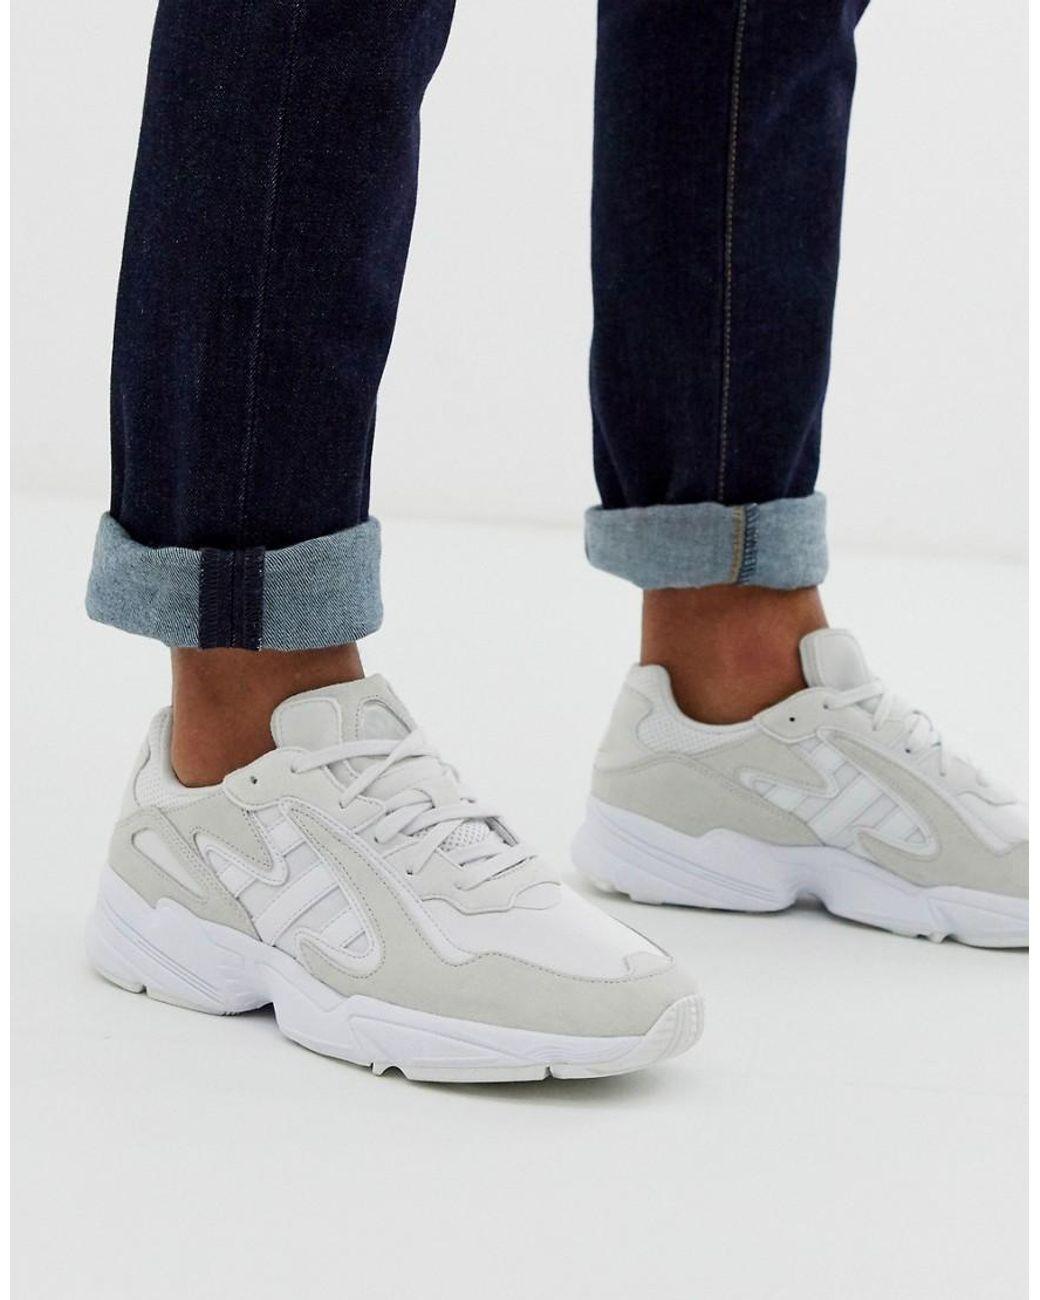 adidas Yung 96 Shoes White | adidas Belgium